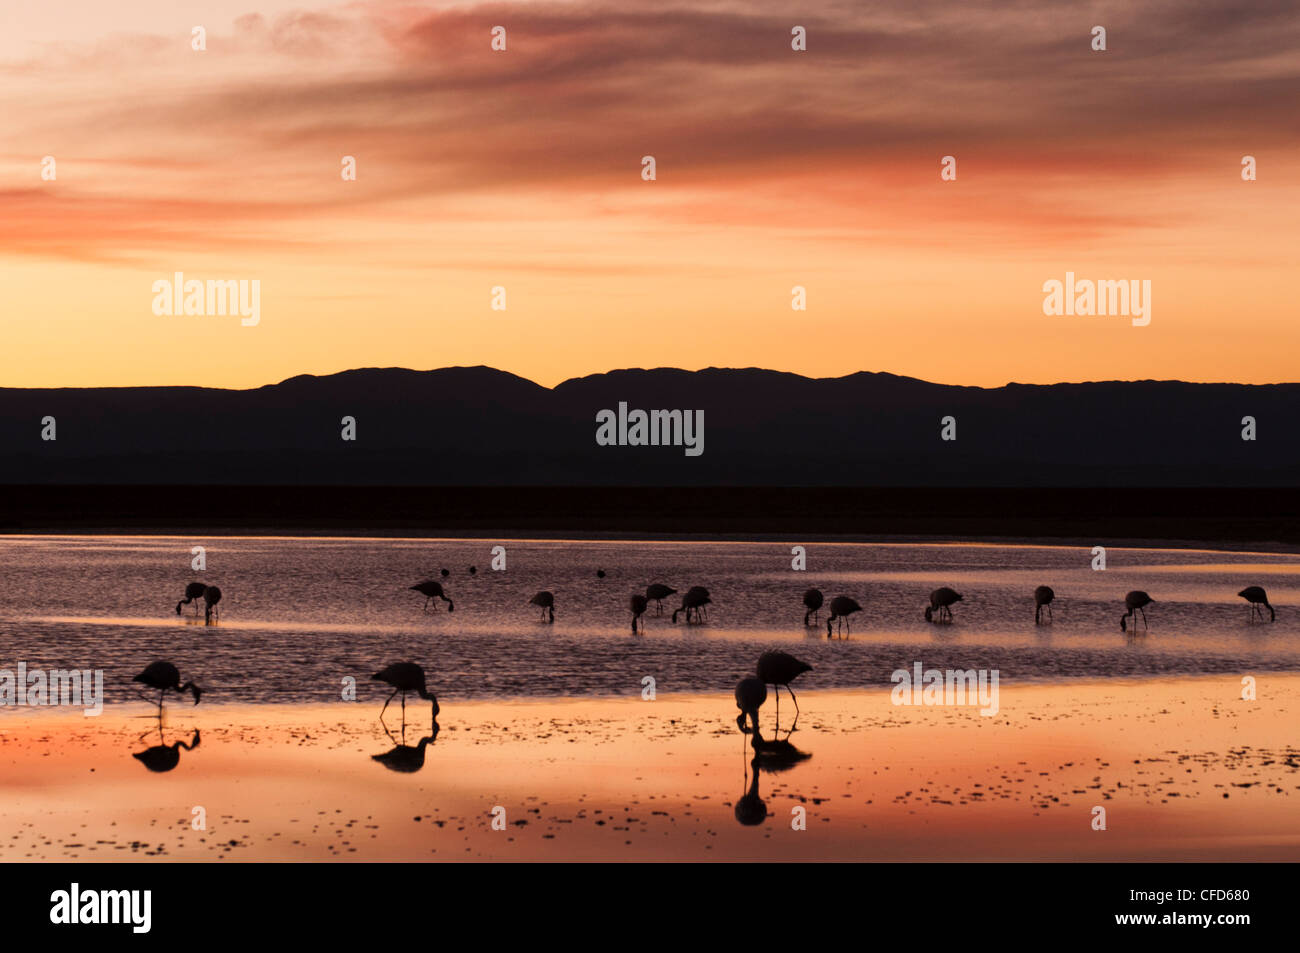 Chilean Flamingo (Phoenicopterus chilensis), Laguna Chaxa, Salar de Atacama, Atacama Desert, Chile, South America - Stock Image